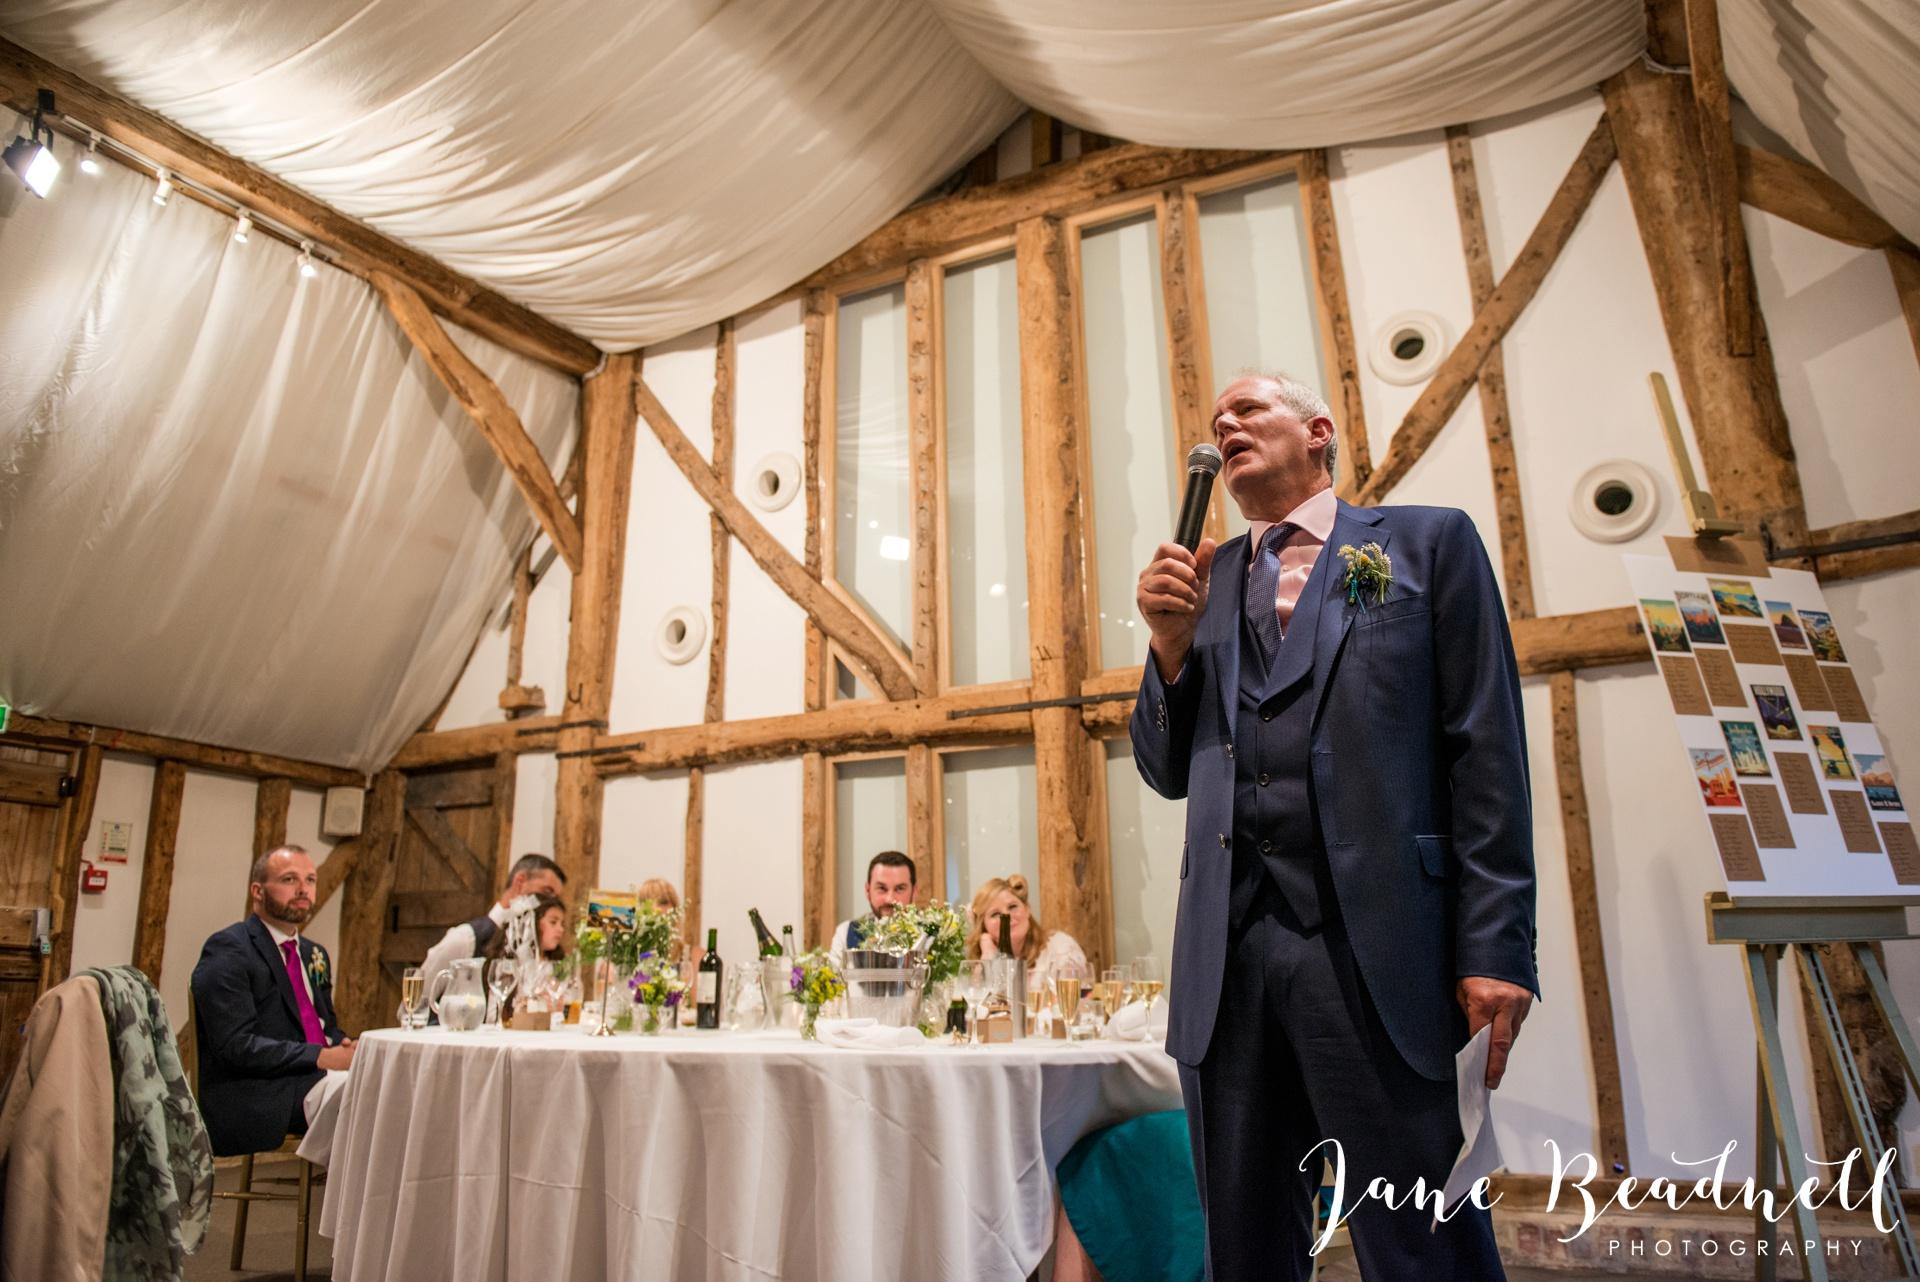 South Farm Wedding photography Hertfordshire by Jane Beadnell Photography fine art wedding photographer_0193